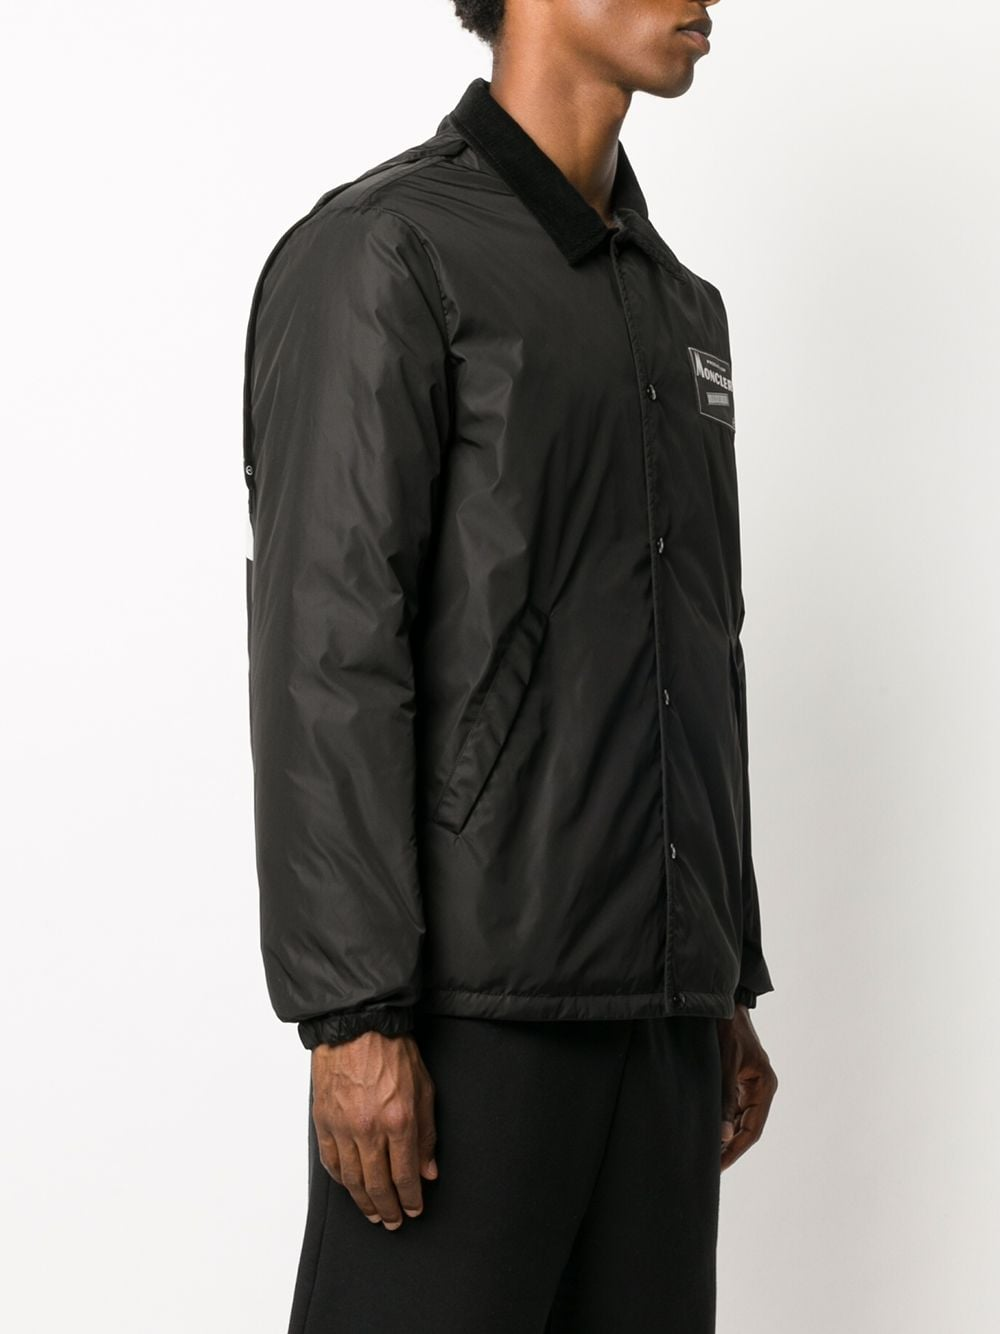 Kurn black jacket with side pockets and back logo print  MONCLER GENIUS |  | KURN 1B520-10-53A10999